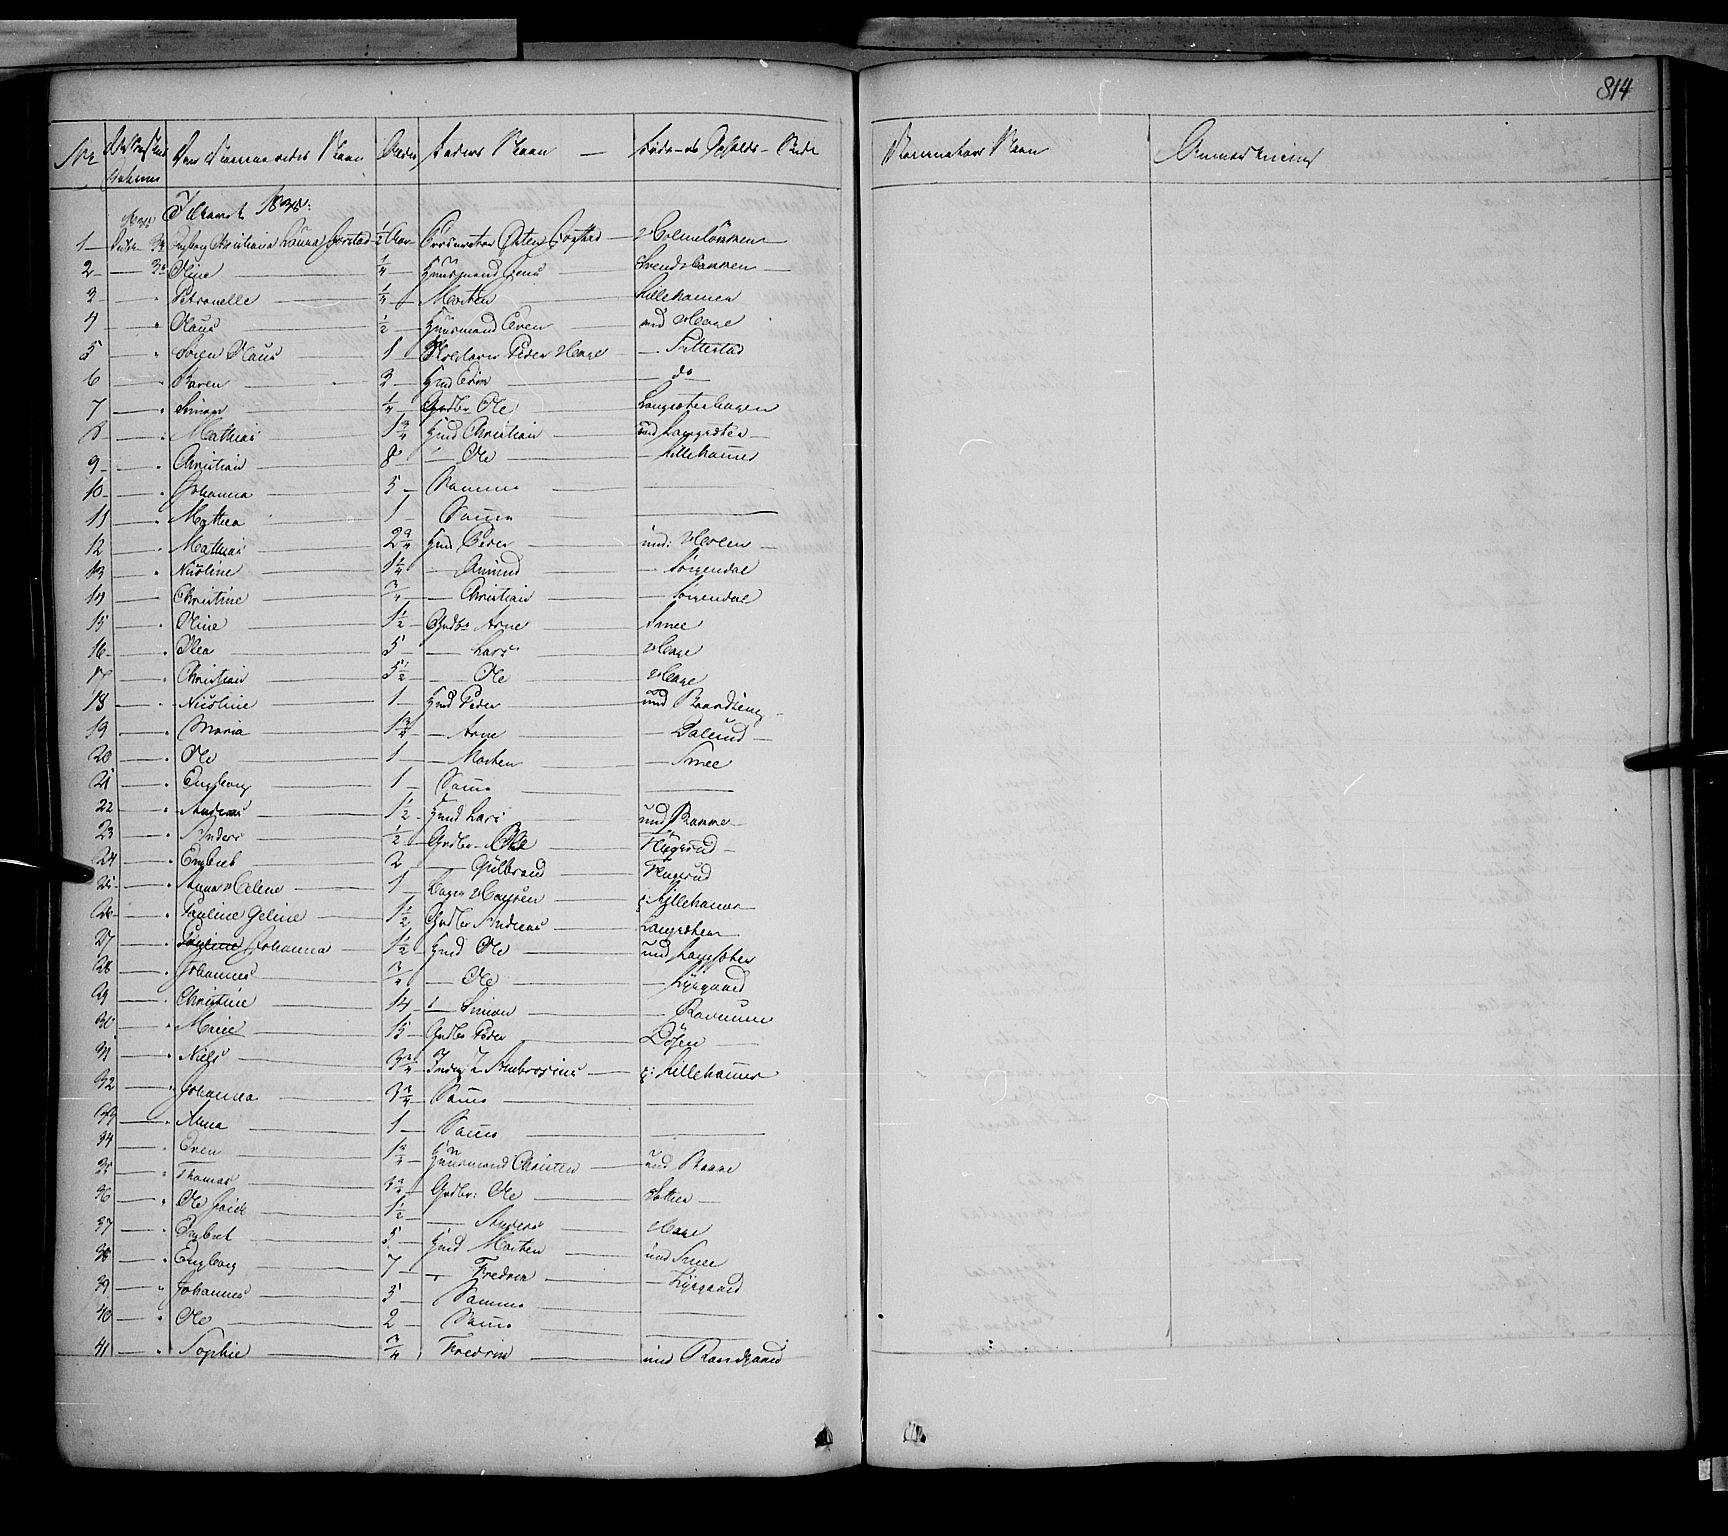 SAH, Fåberg prestekontor, Ministerialbok nr. 5, 1836-1854, s. 813-814